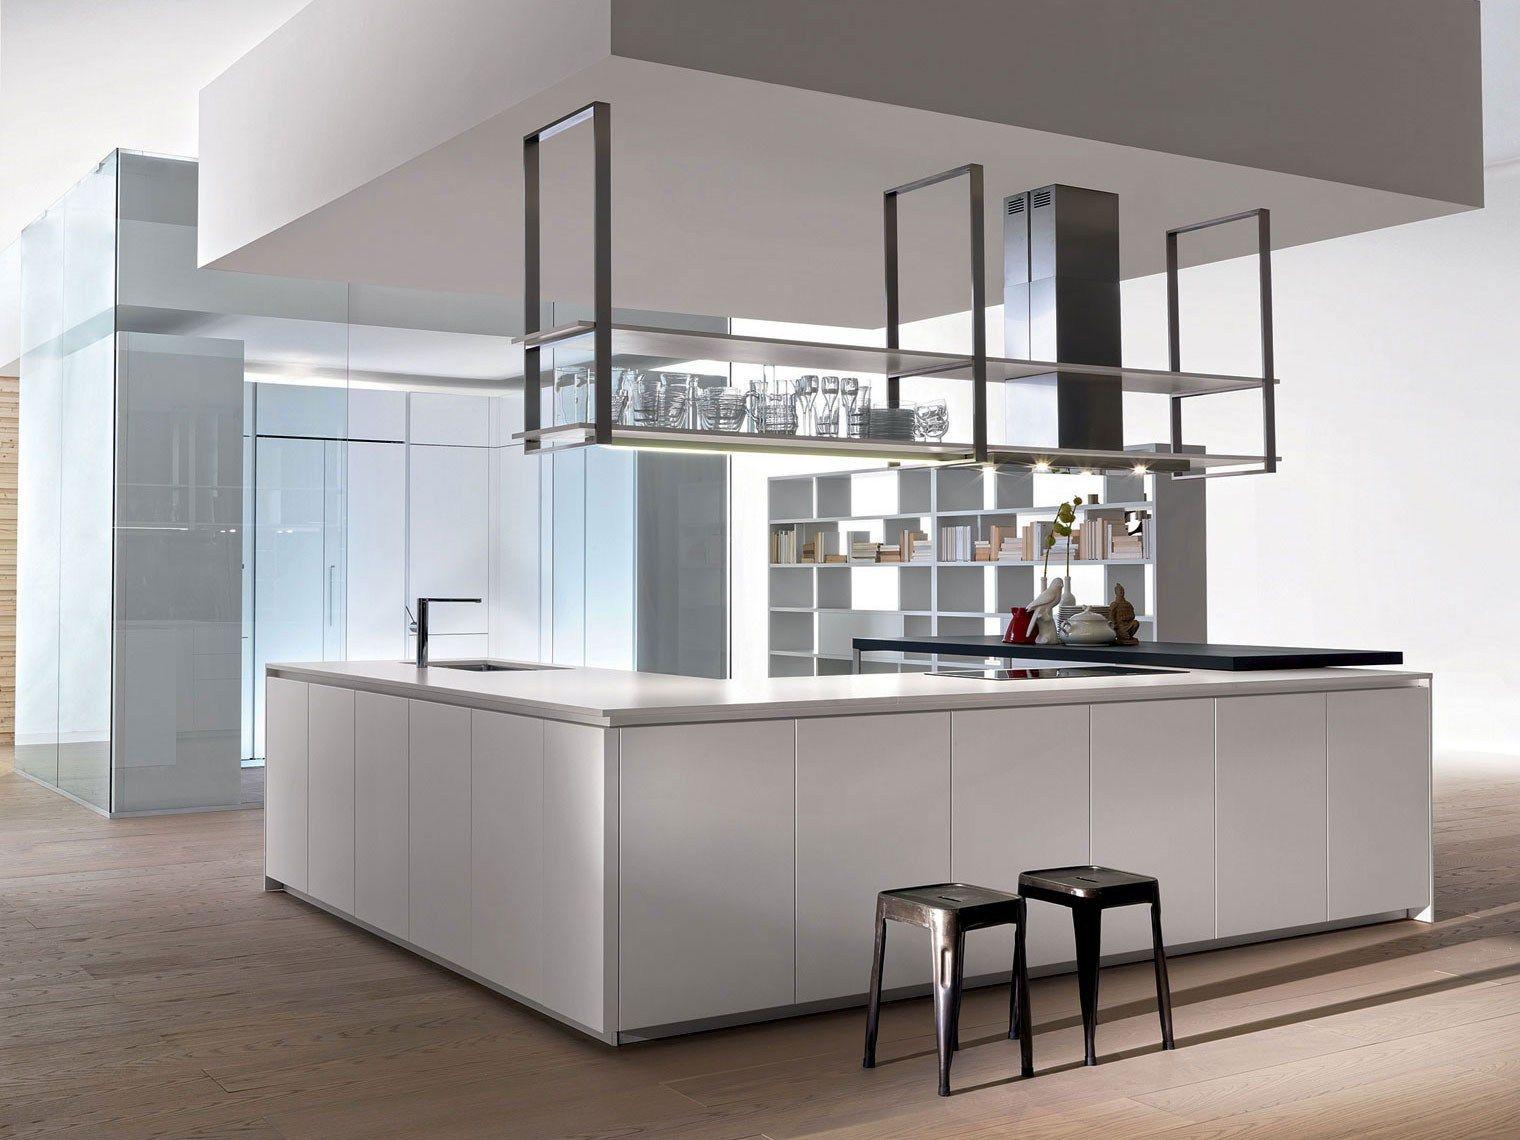 cucina con isola senza maniglie hi-line 6/hi-line by dada   design ... - Cucina On Line